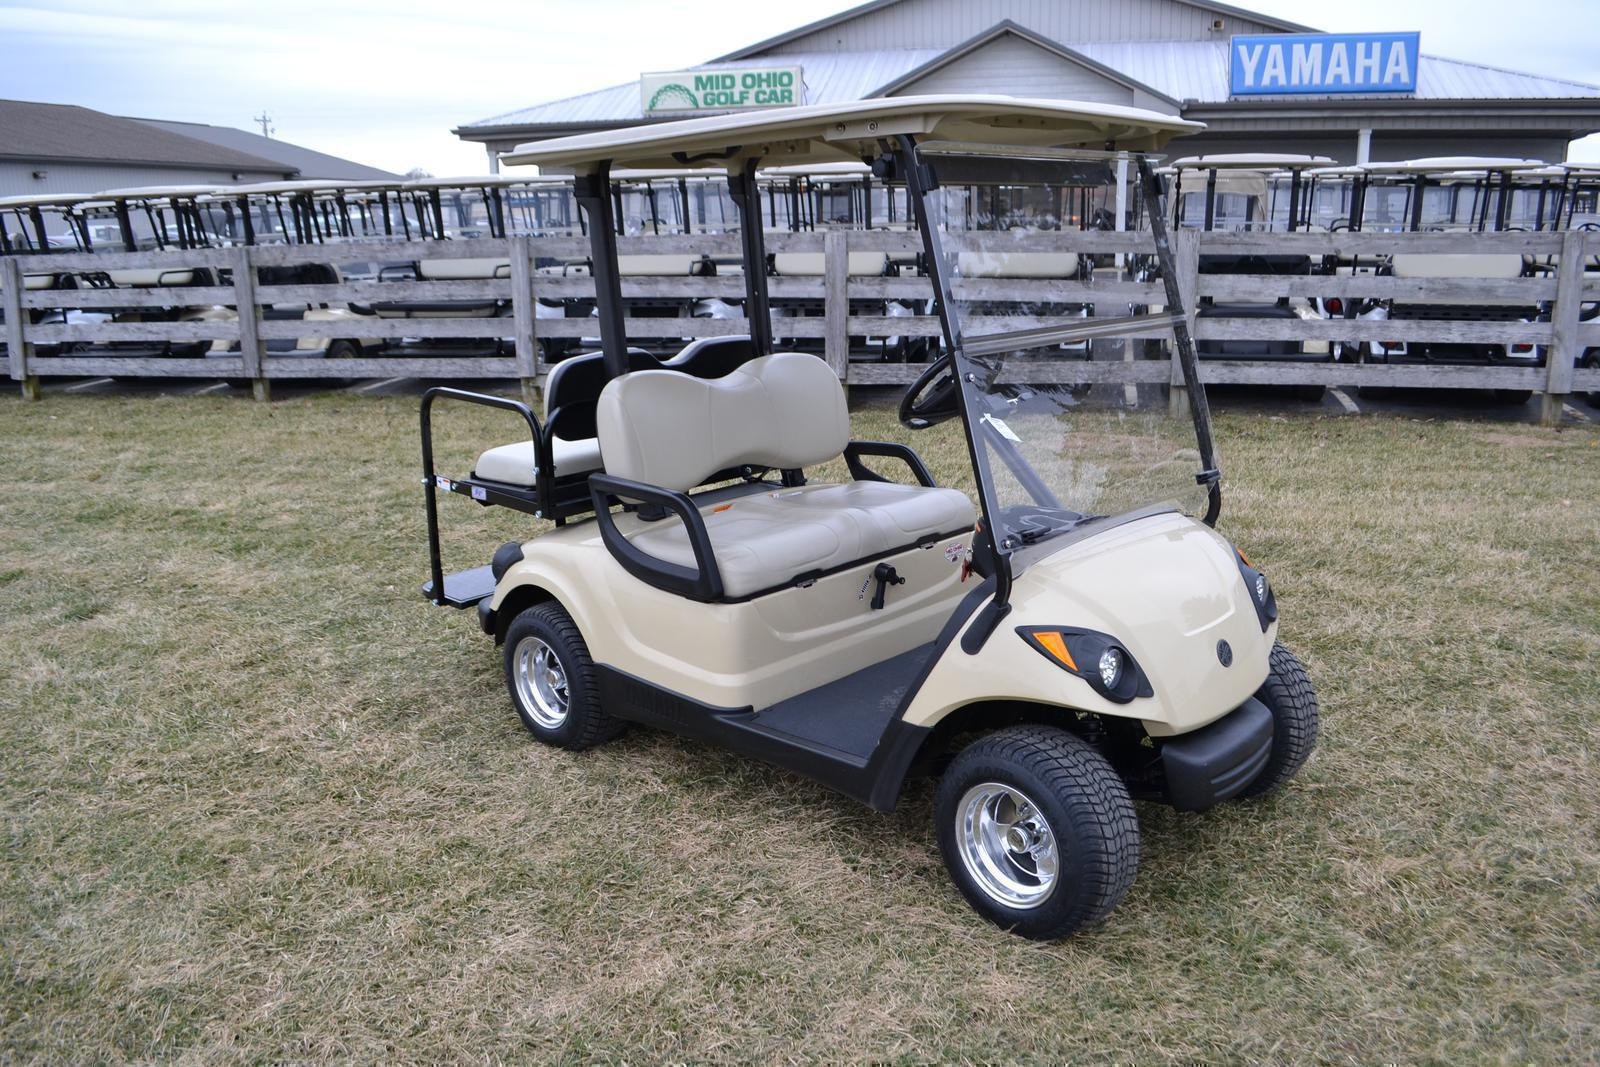 Inventory from Yamaha Mid Ohio Golf Car, Inc  Heath, OH 1